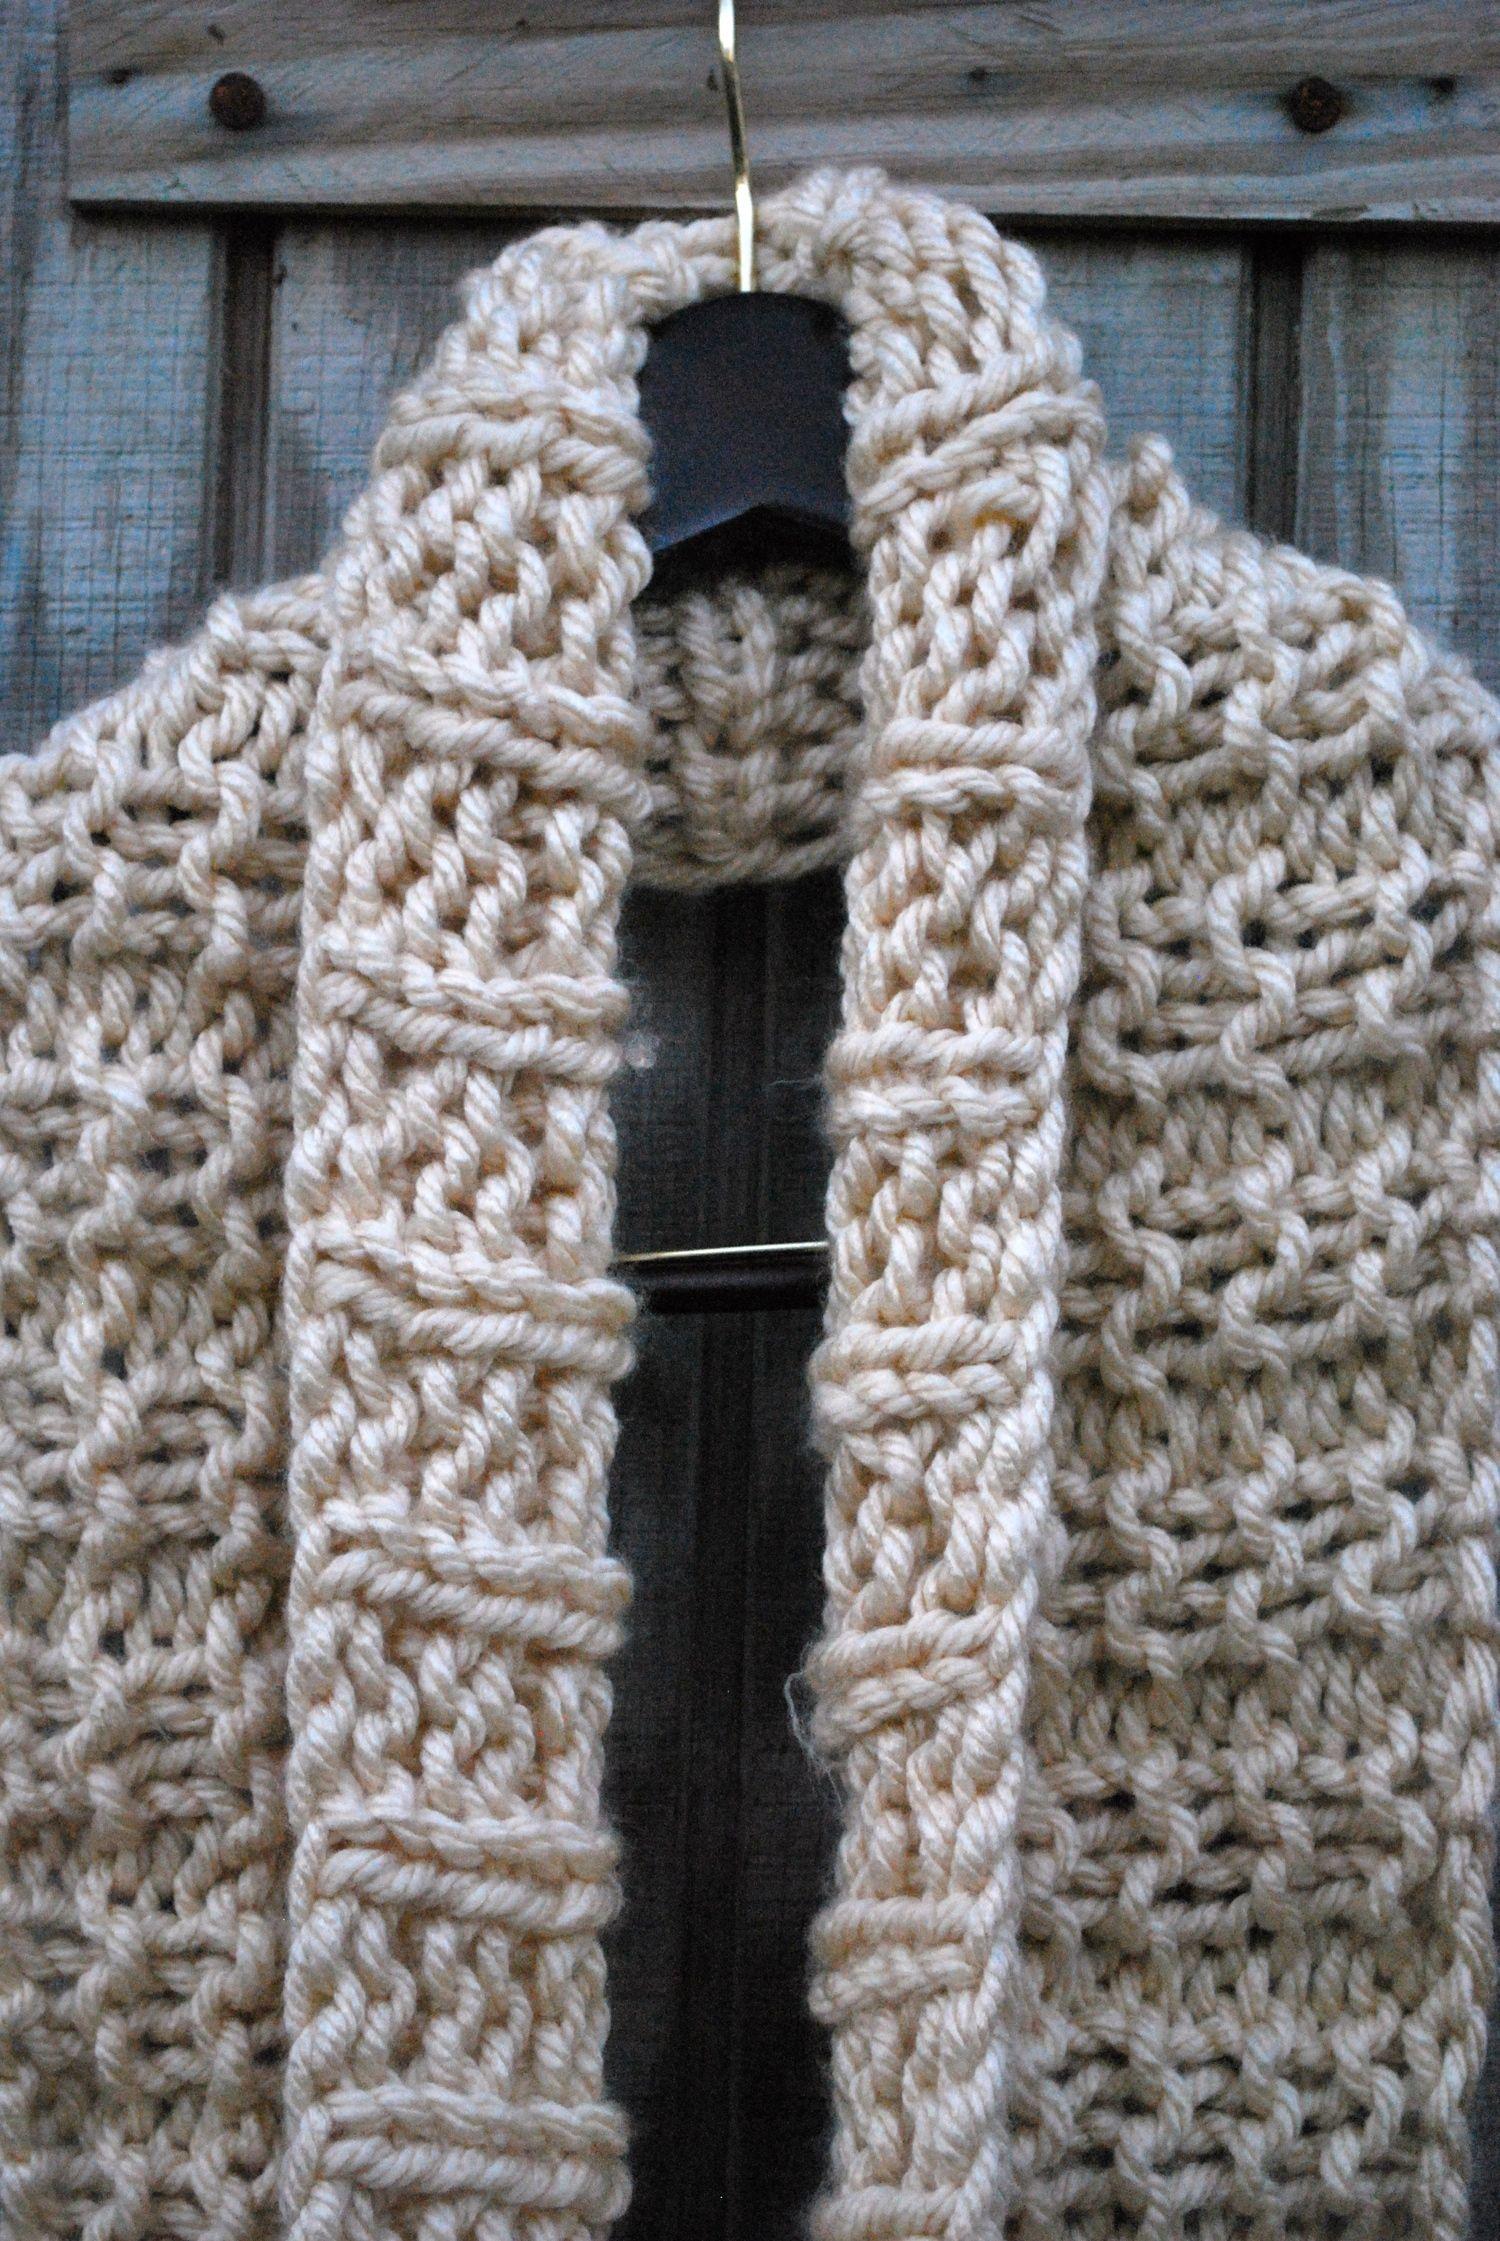 MID-DECEMBER INFINITY SCARF KNITTING PATTERN | knitting | Pinterest ...